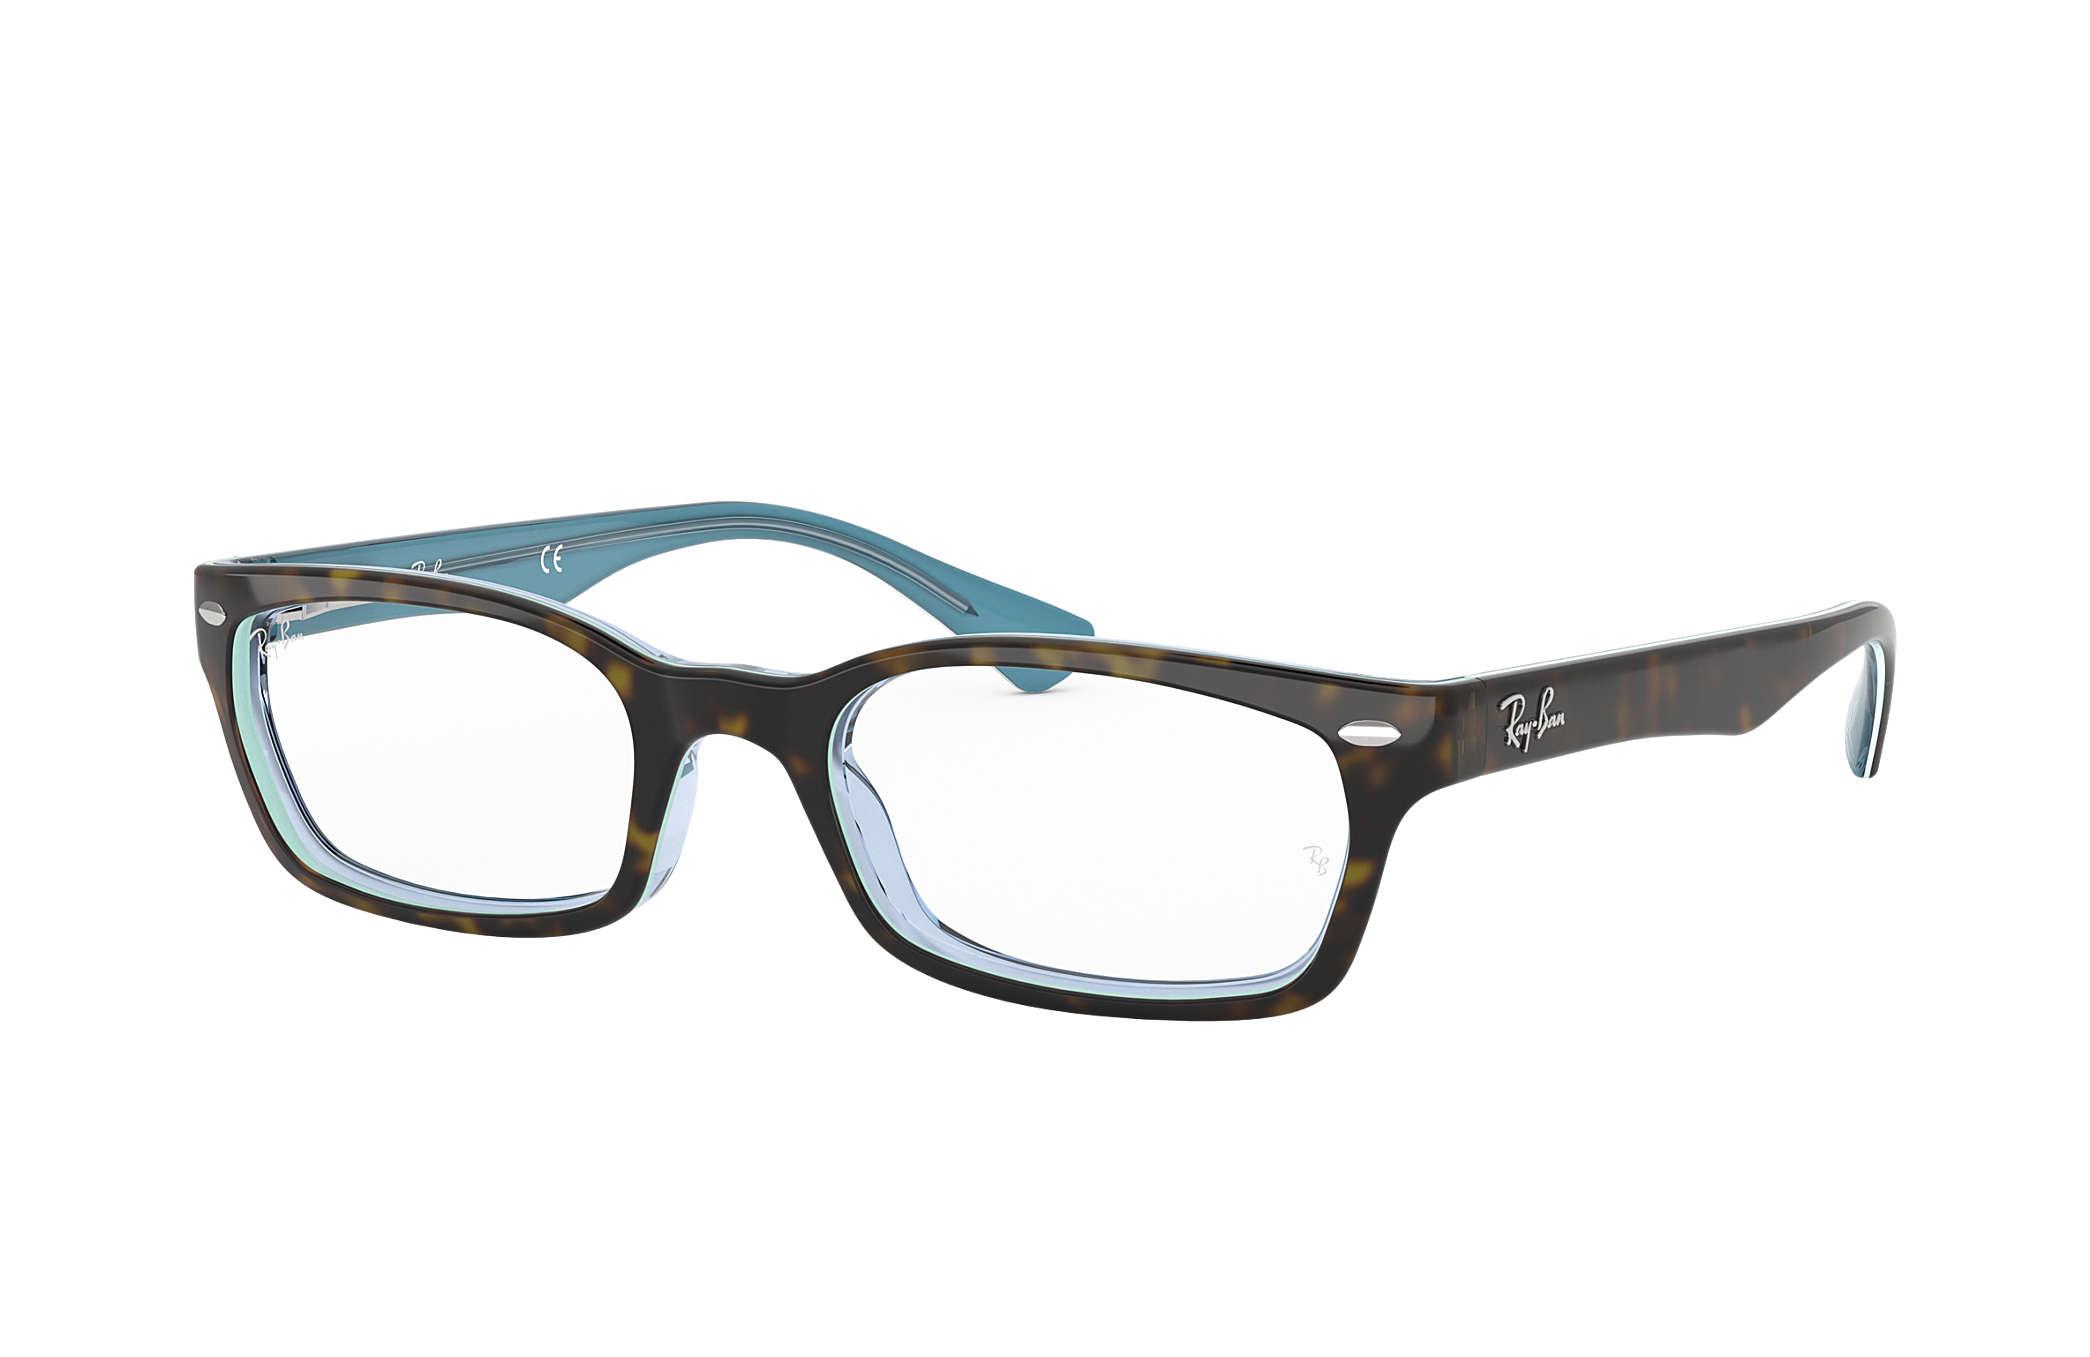 cc2d4d1e6f2 Ray-Ban prescription glasses RB5150 Tortoise - Acetate ...